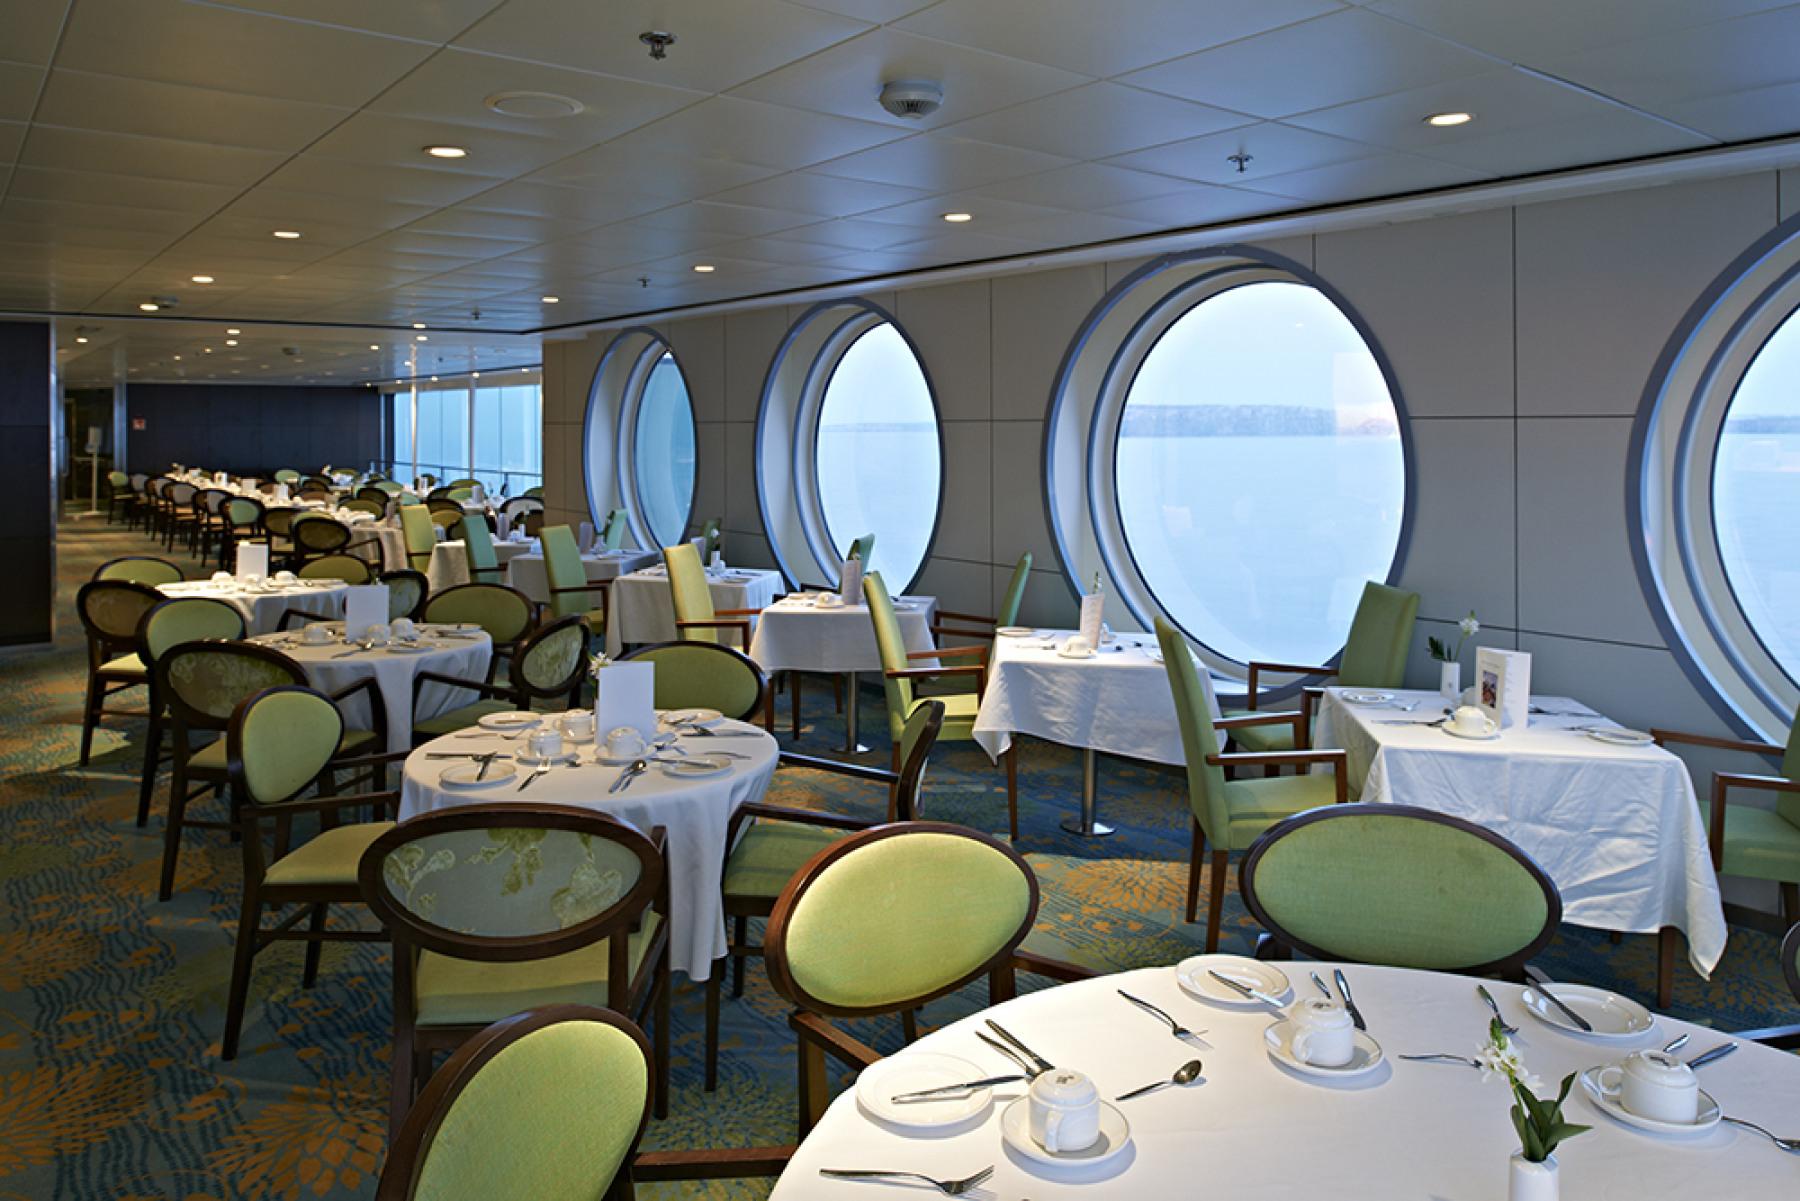 fred olsen cruise lines balmoral dining 2 2014.jpg